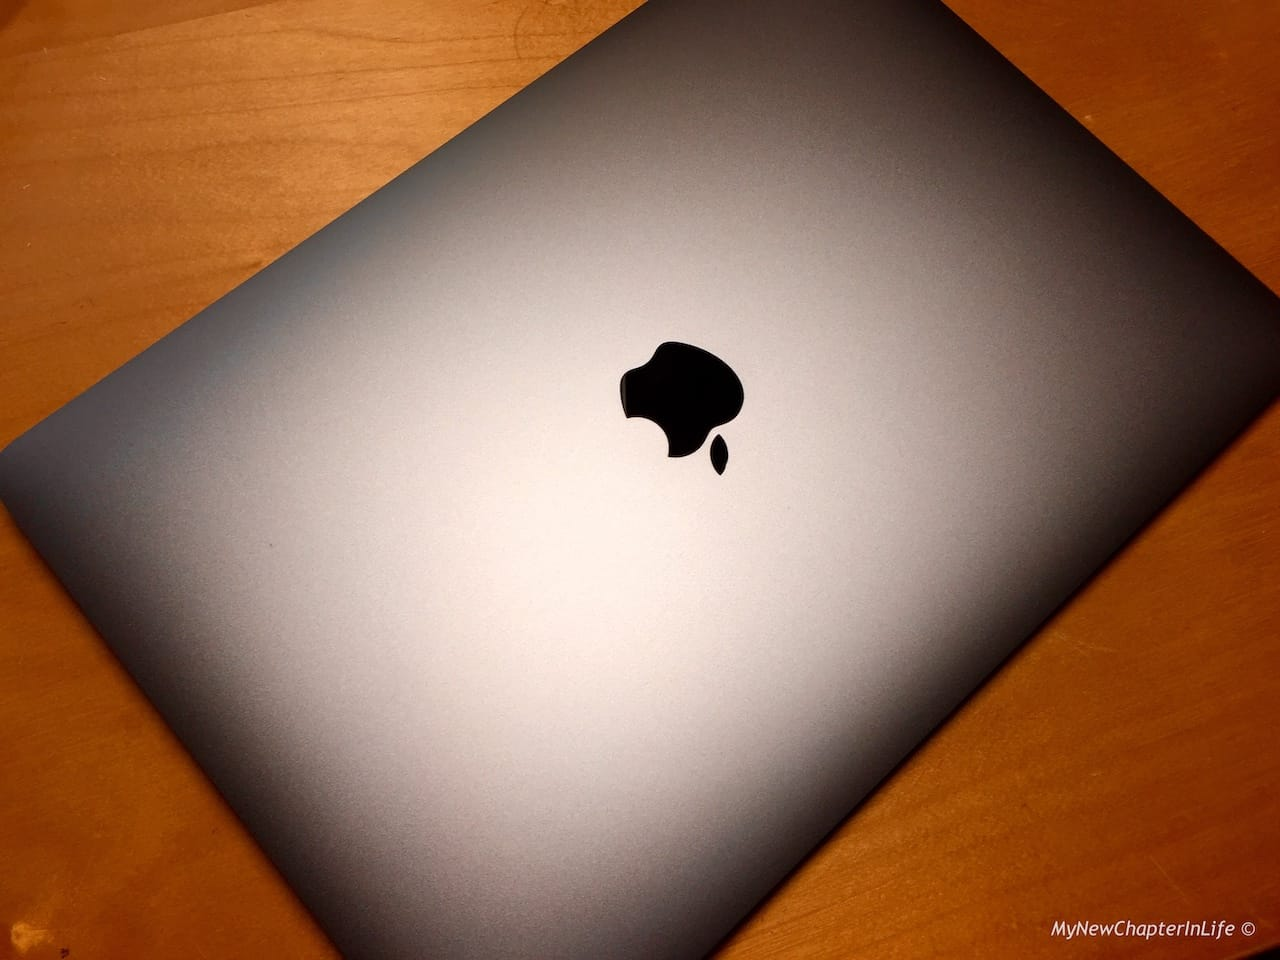 Refurbished June 2017 Macbook Pro 13-inch